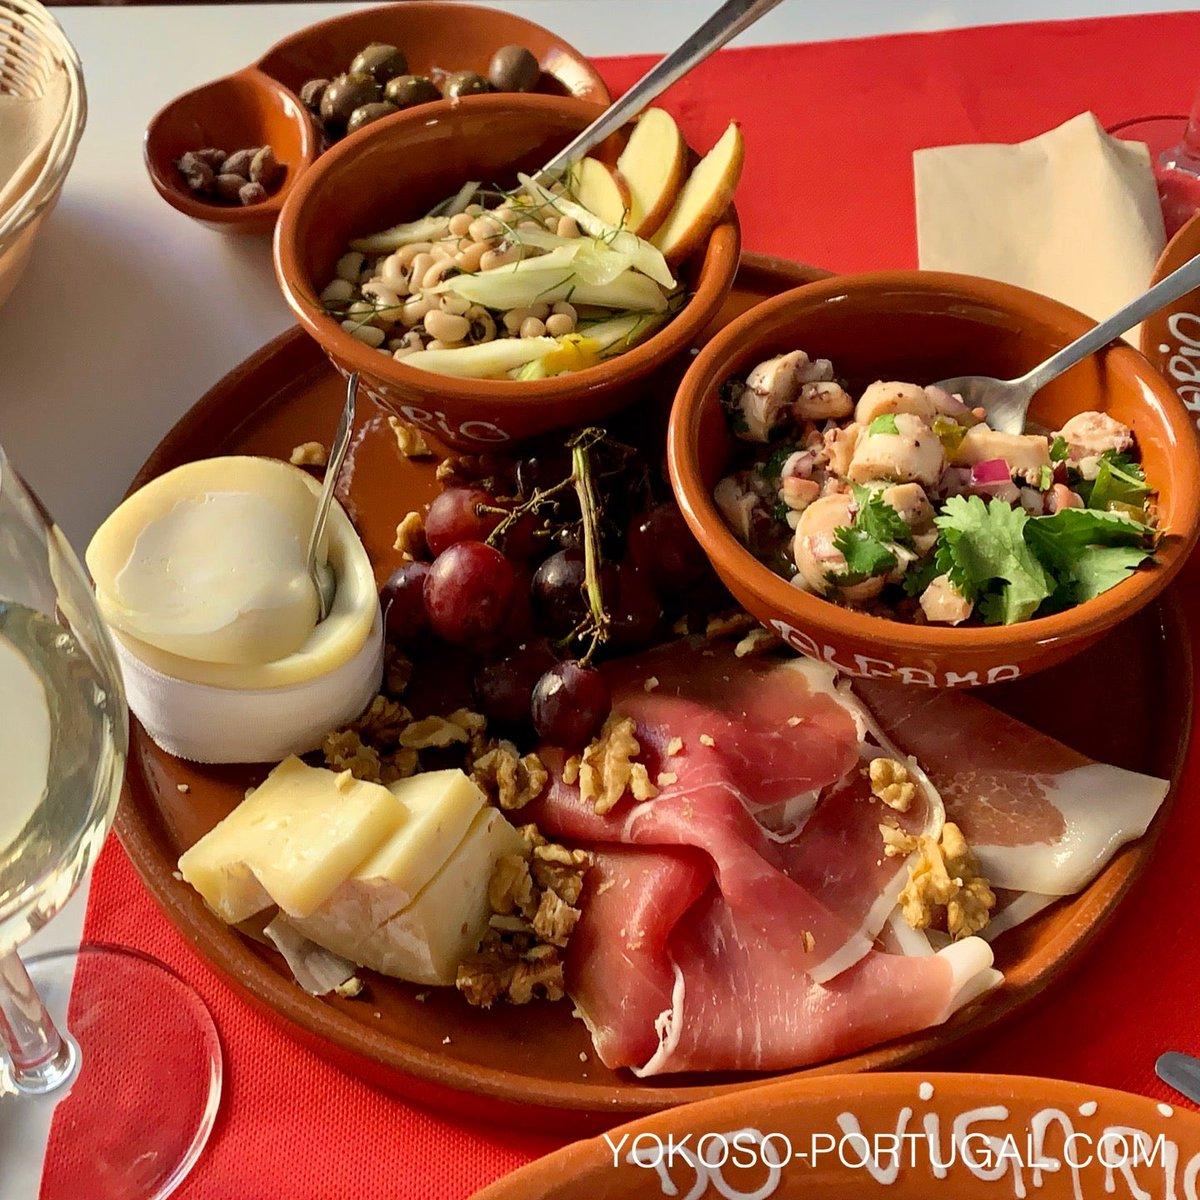 test ツイッターメディア - リスボン・アルファマ地区にあるおすすめレストラン。ワインを飲みながら美味しいタパスが食べられます。 (@ doVigário PubandRecords in Lisbon) https://t.co/JLdOOmYqAw https://t.co/xb1B2z3yBq